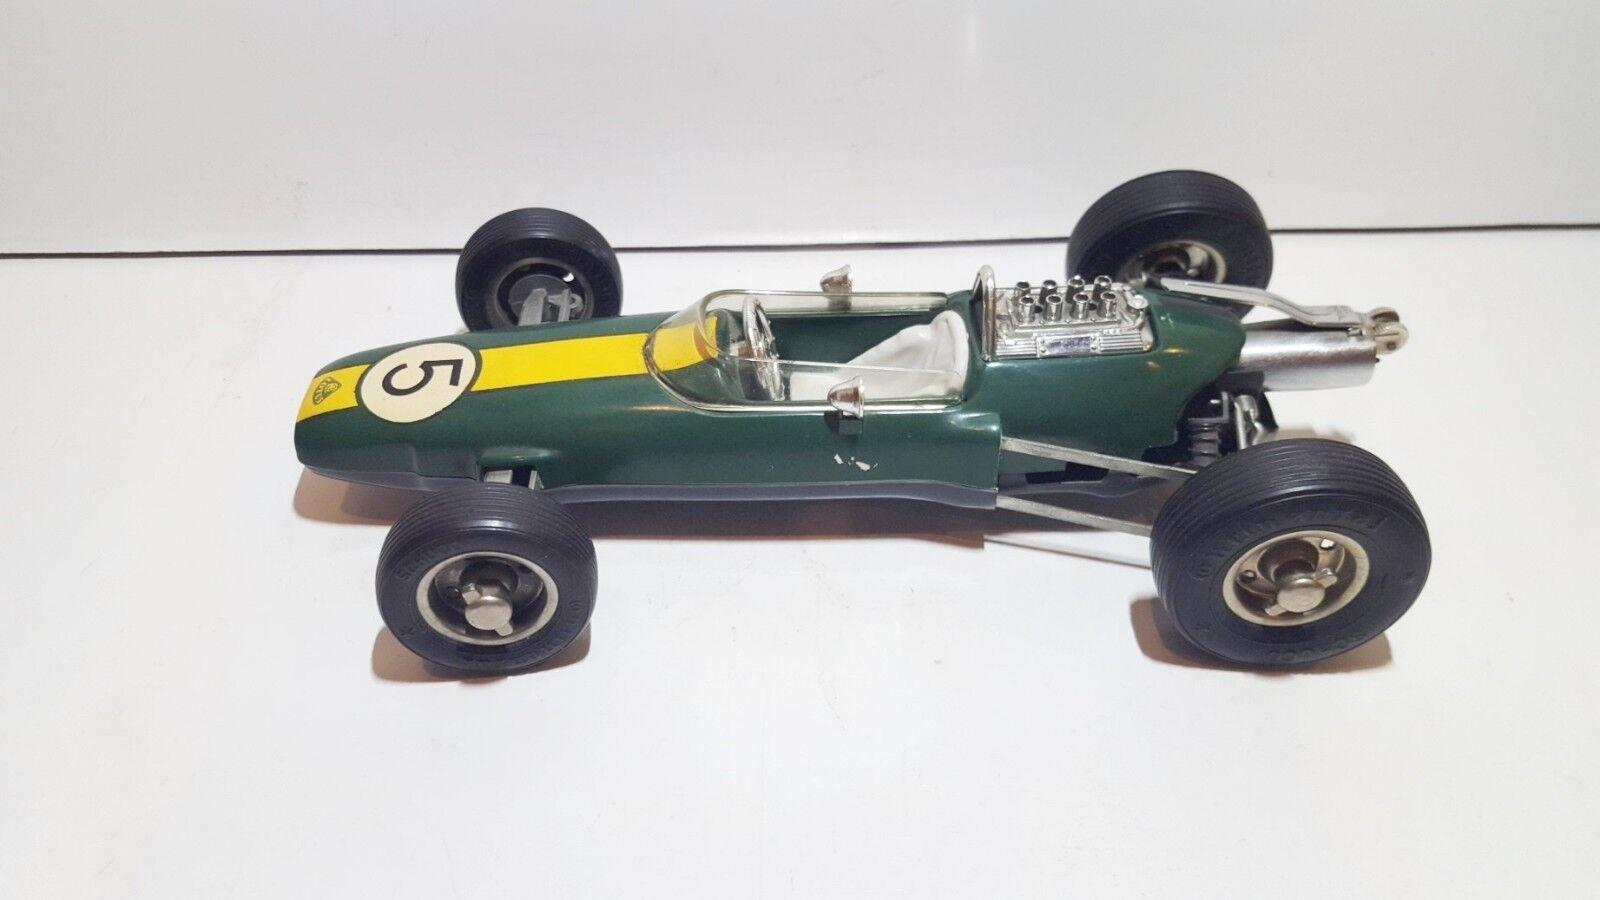 Schuco 1071 Lotus Climax 33 F1 w. lighter Consul B172 1960 very good condit 1/16